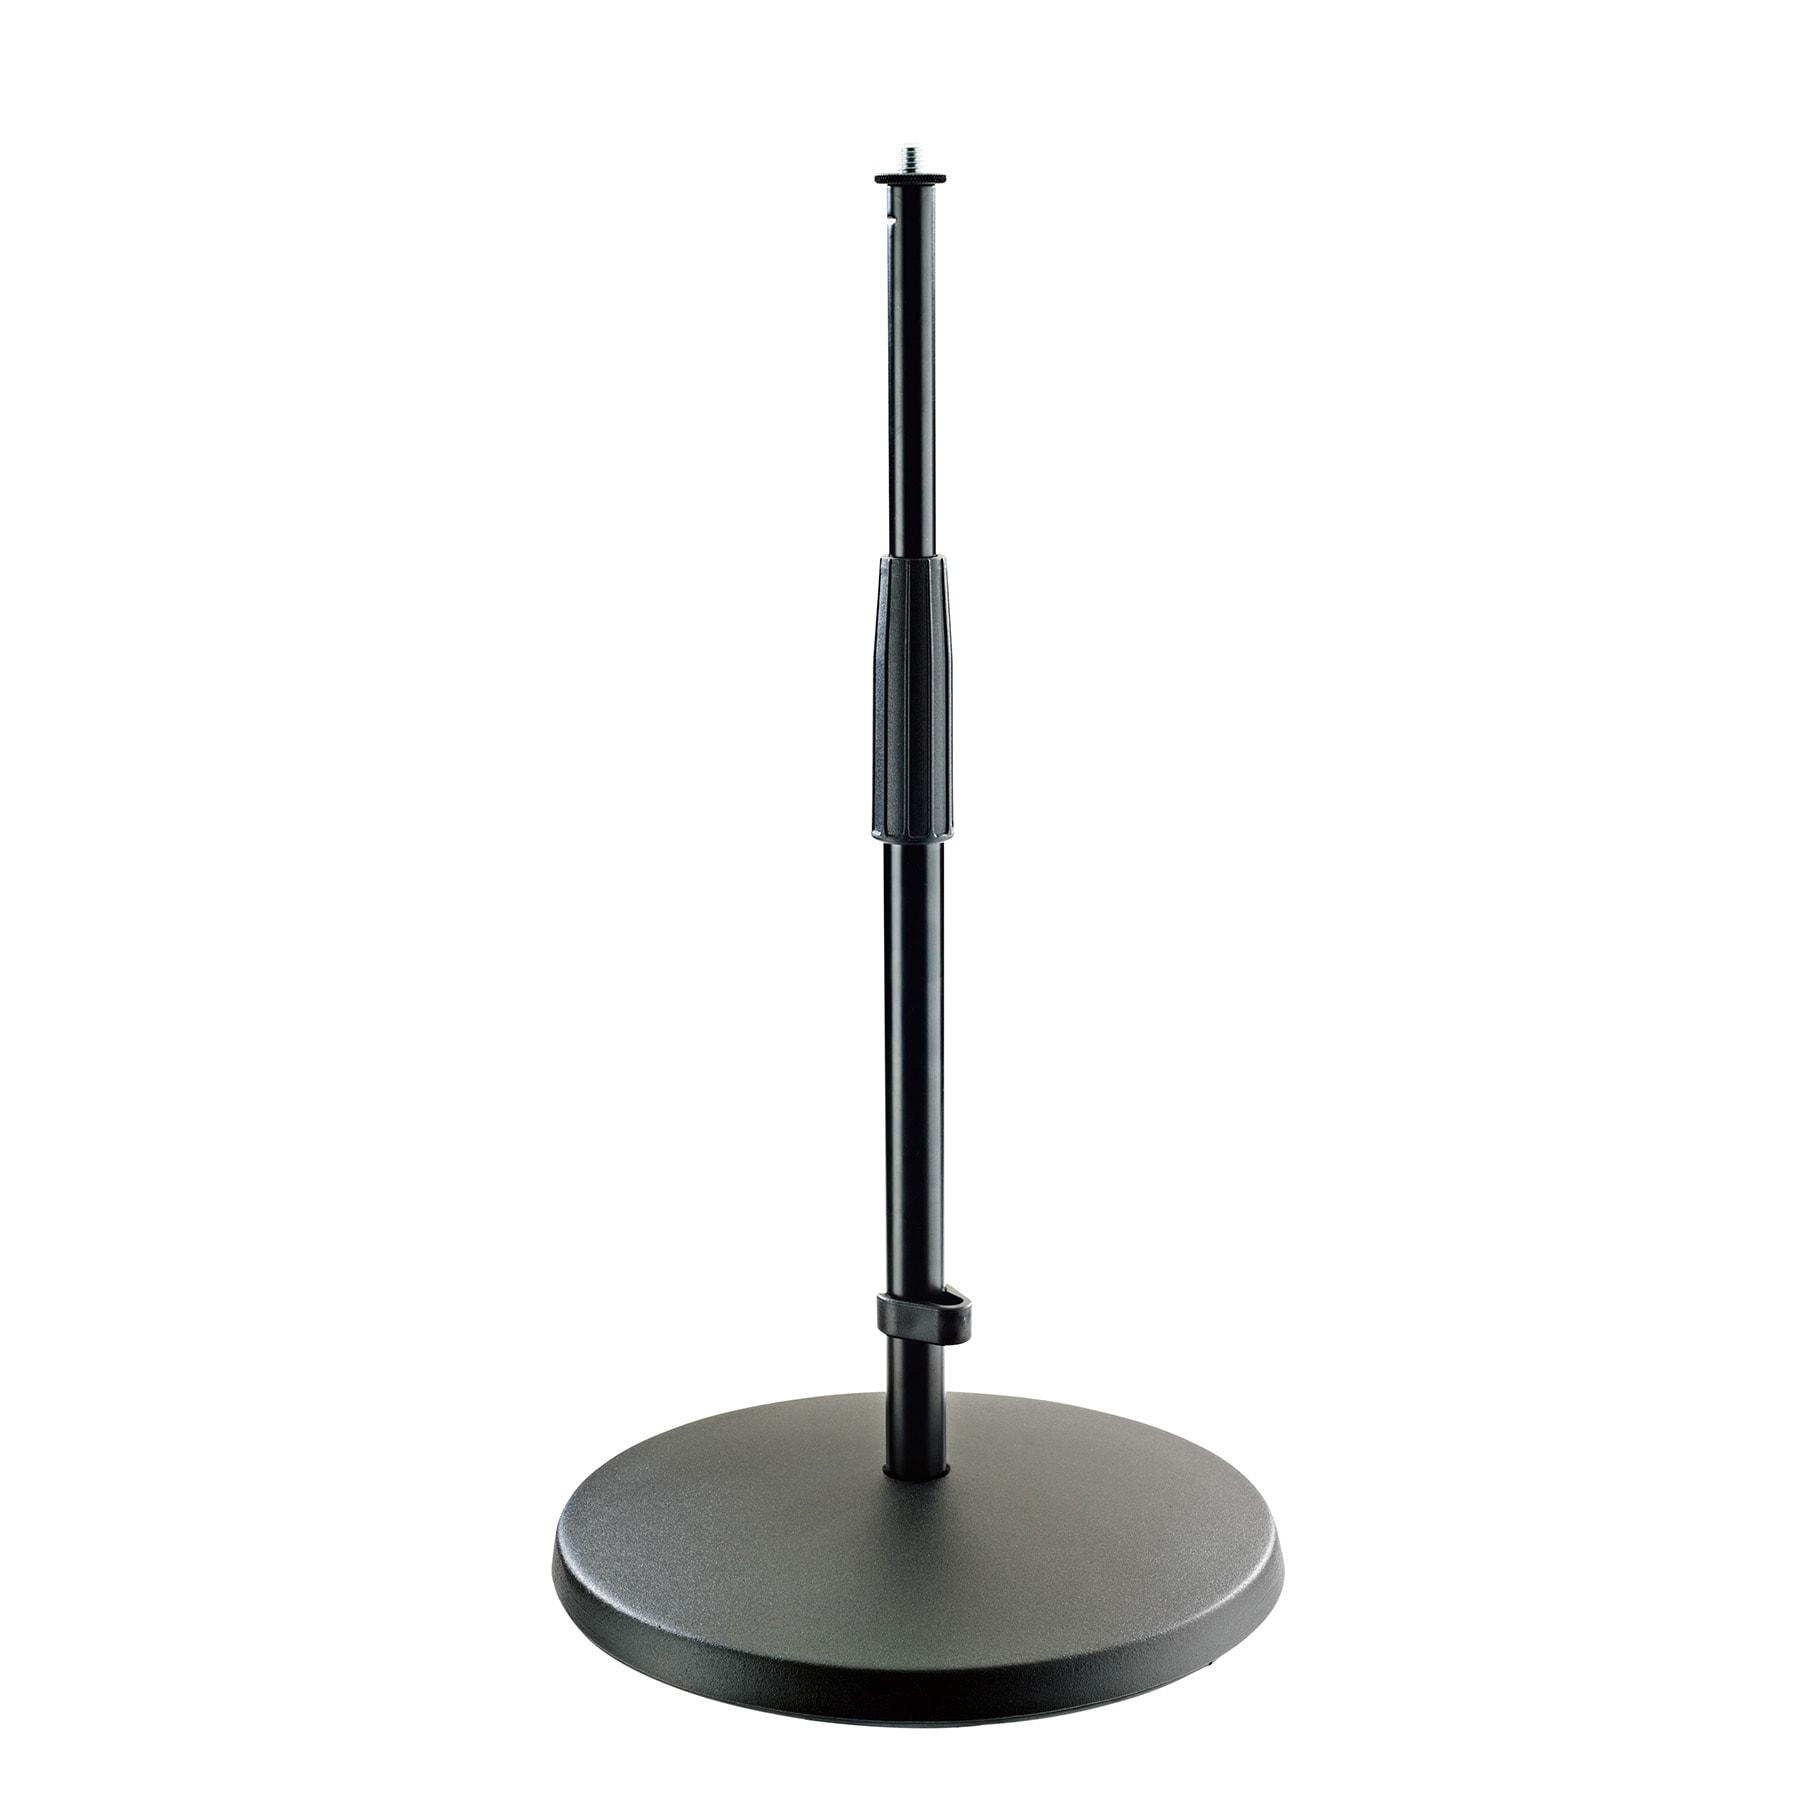 KM23323 - Microphone stand